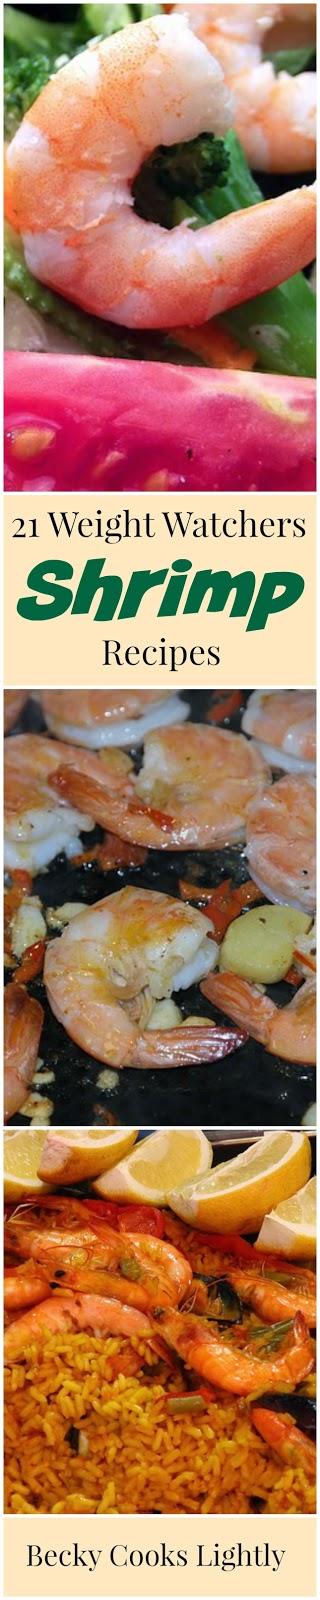 Weight Watchers Shrimp Recipes | Becky Cooks Lightly